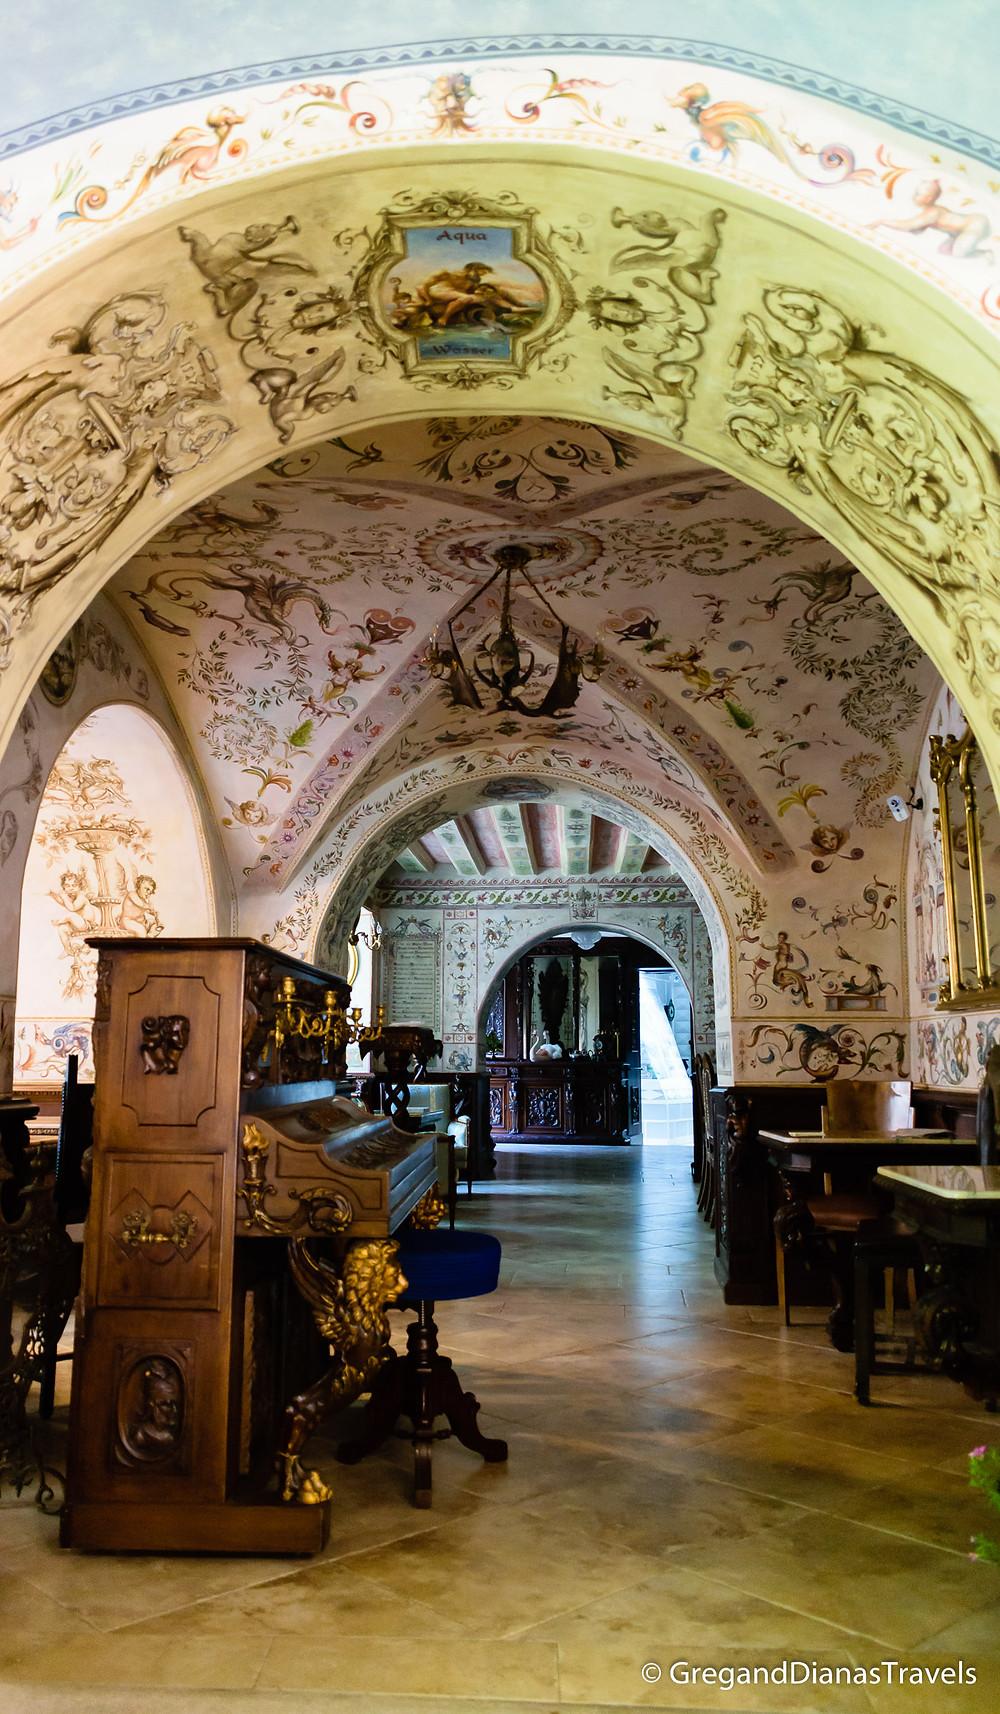 Back room closed for visitors, Kormuth Patisserie Bratislava, Bratislava Slovakia, Travelblog